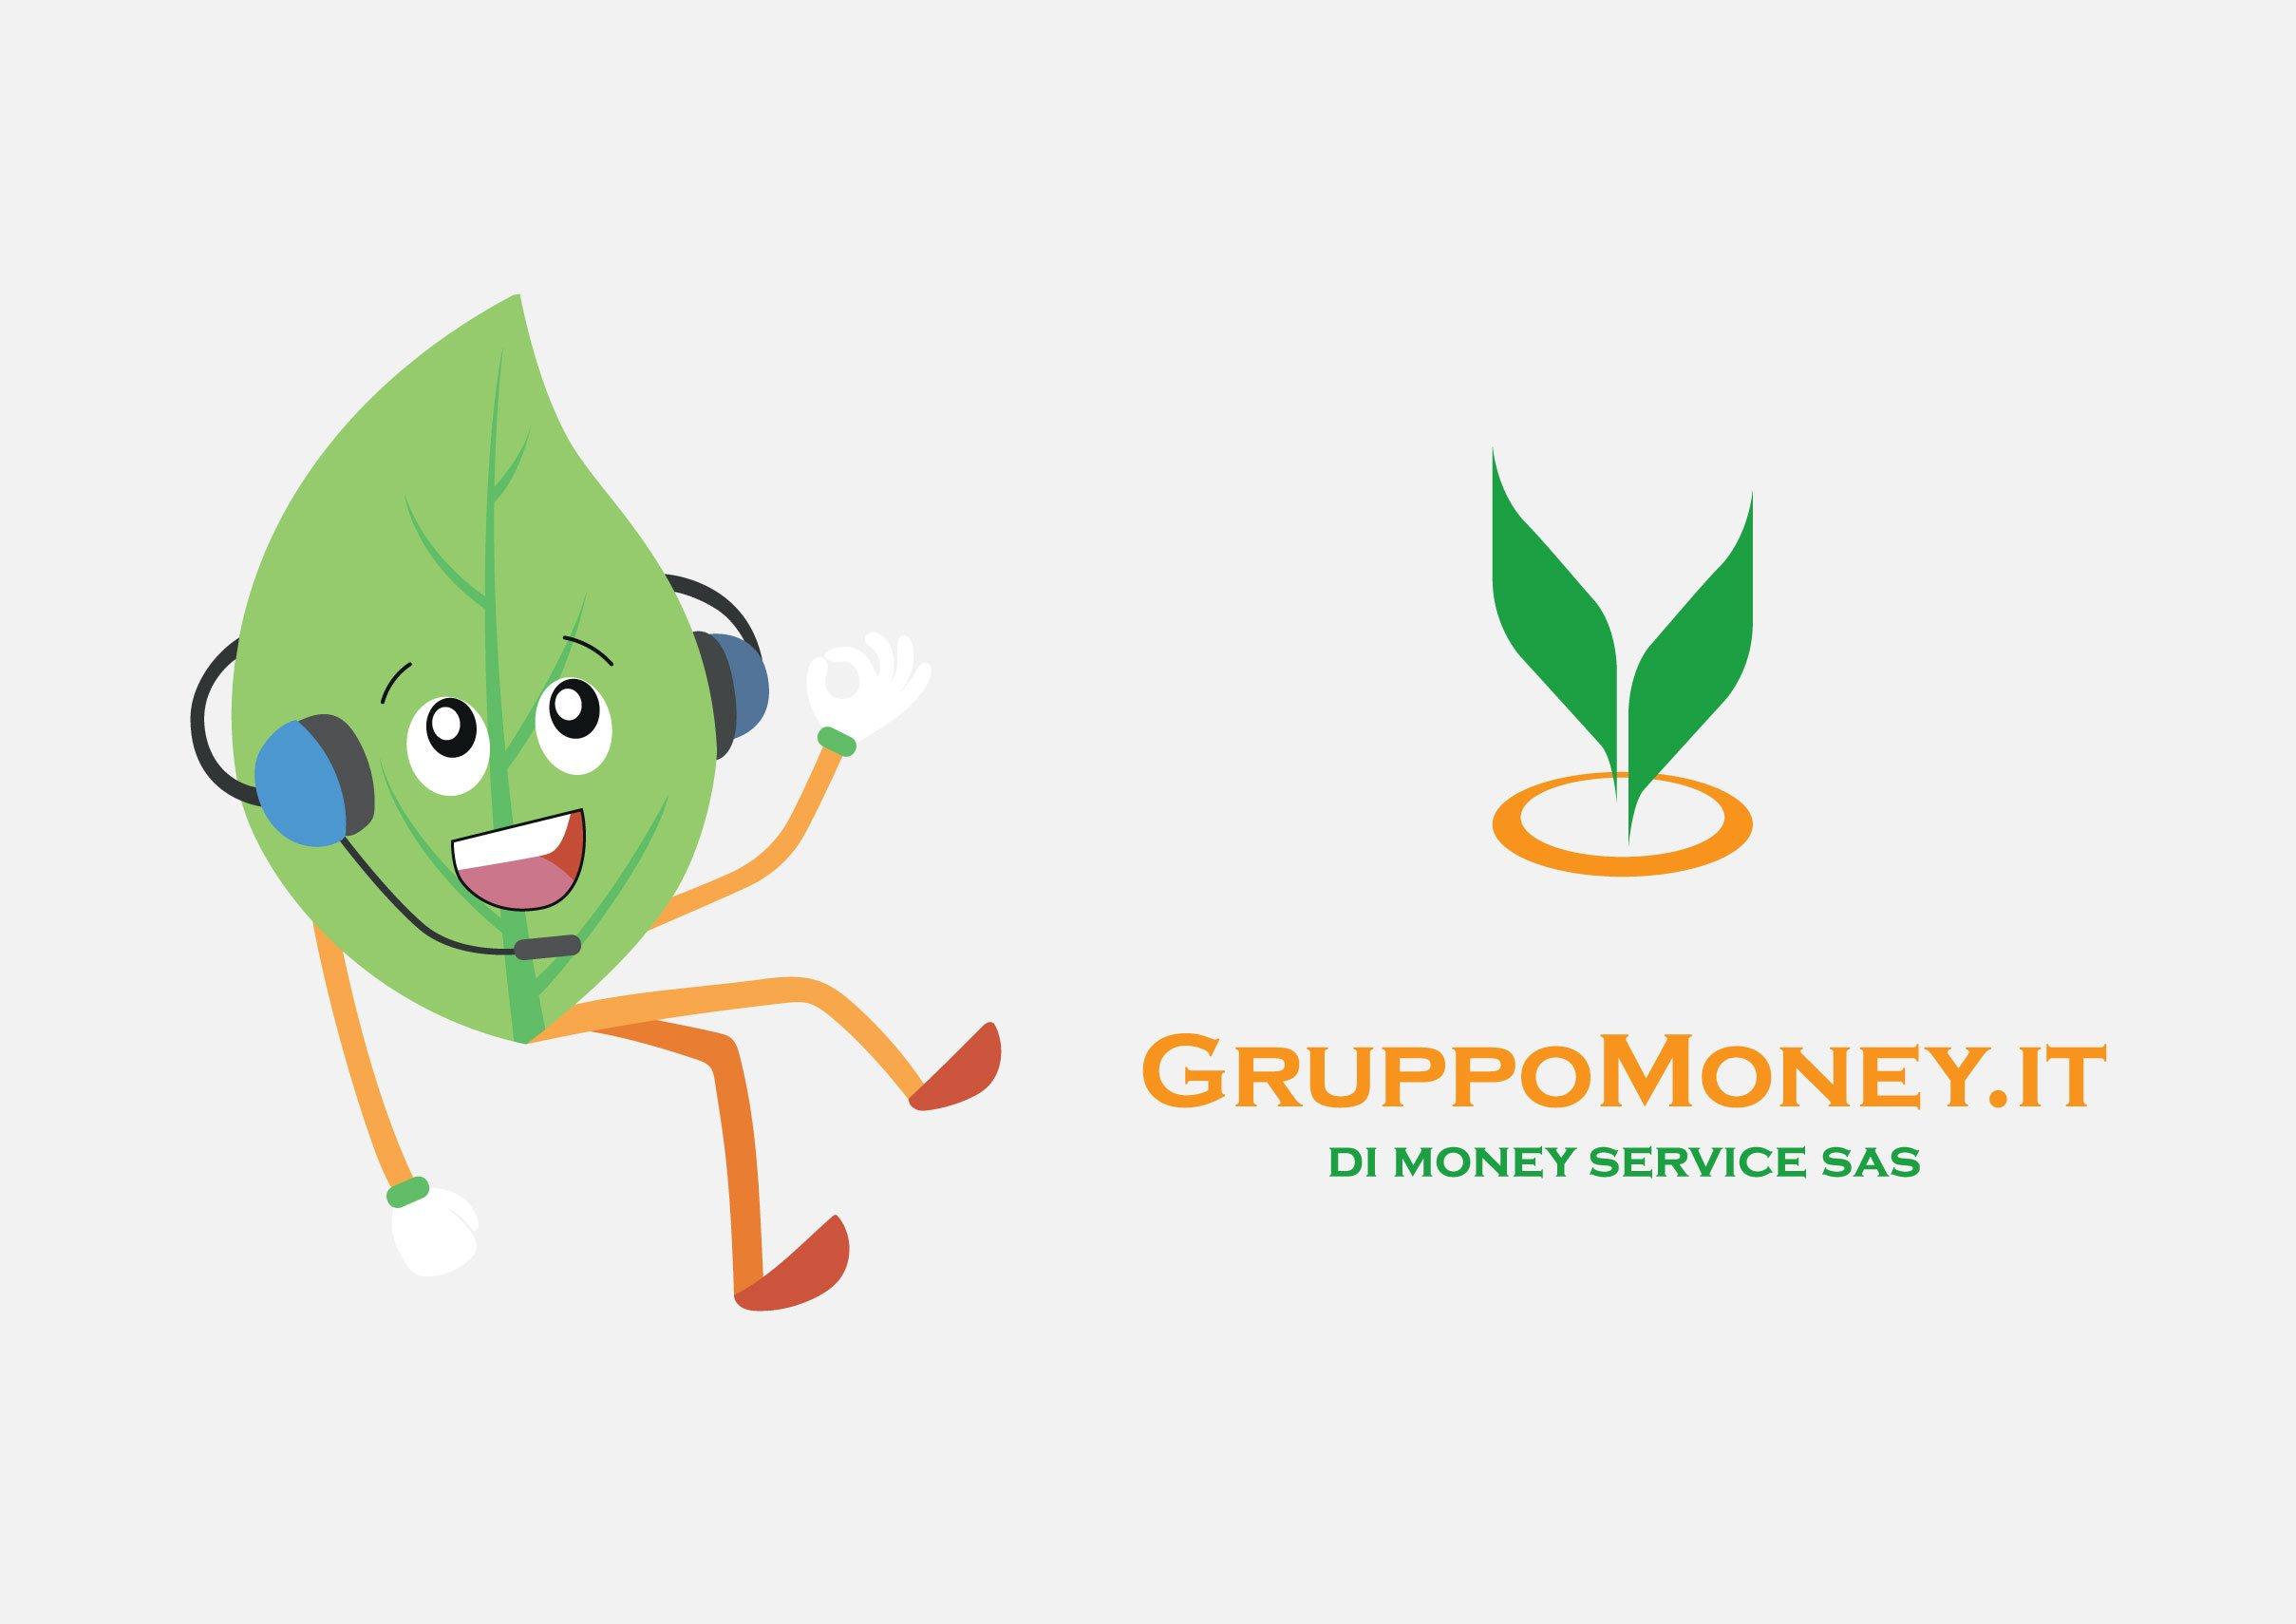 GRUPPO MONEY